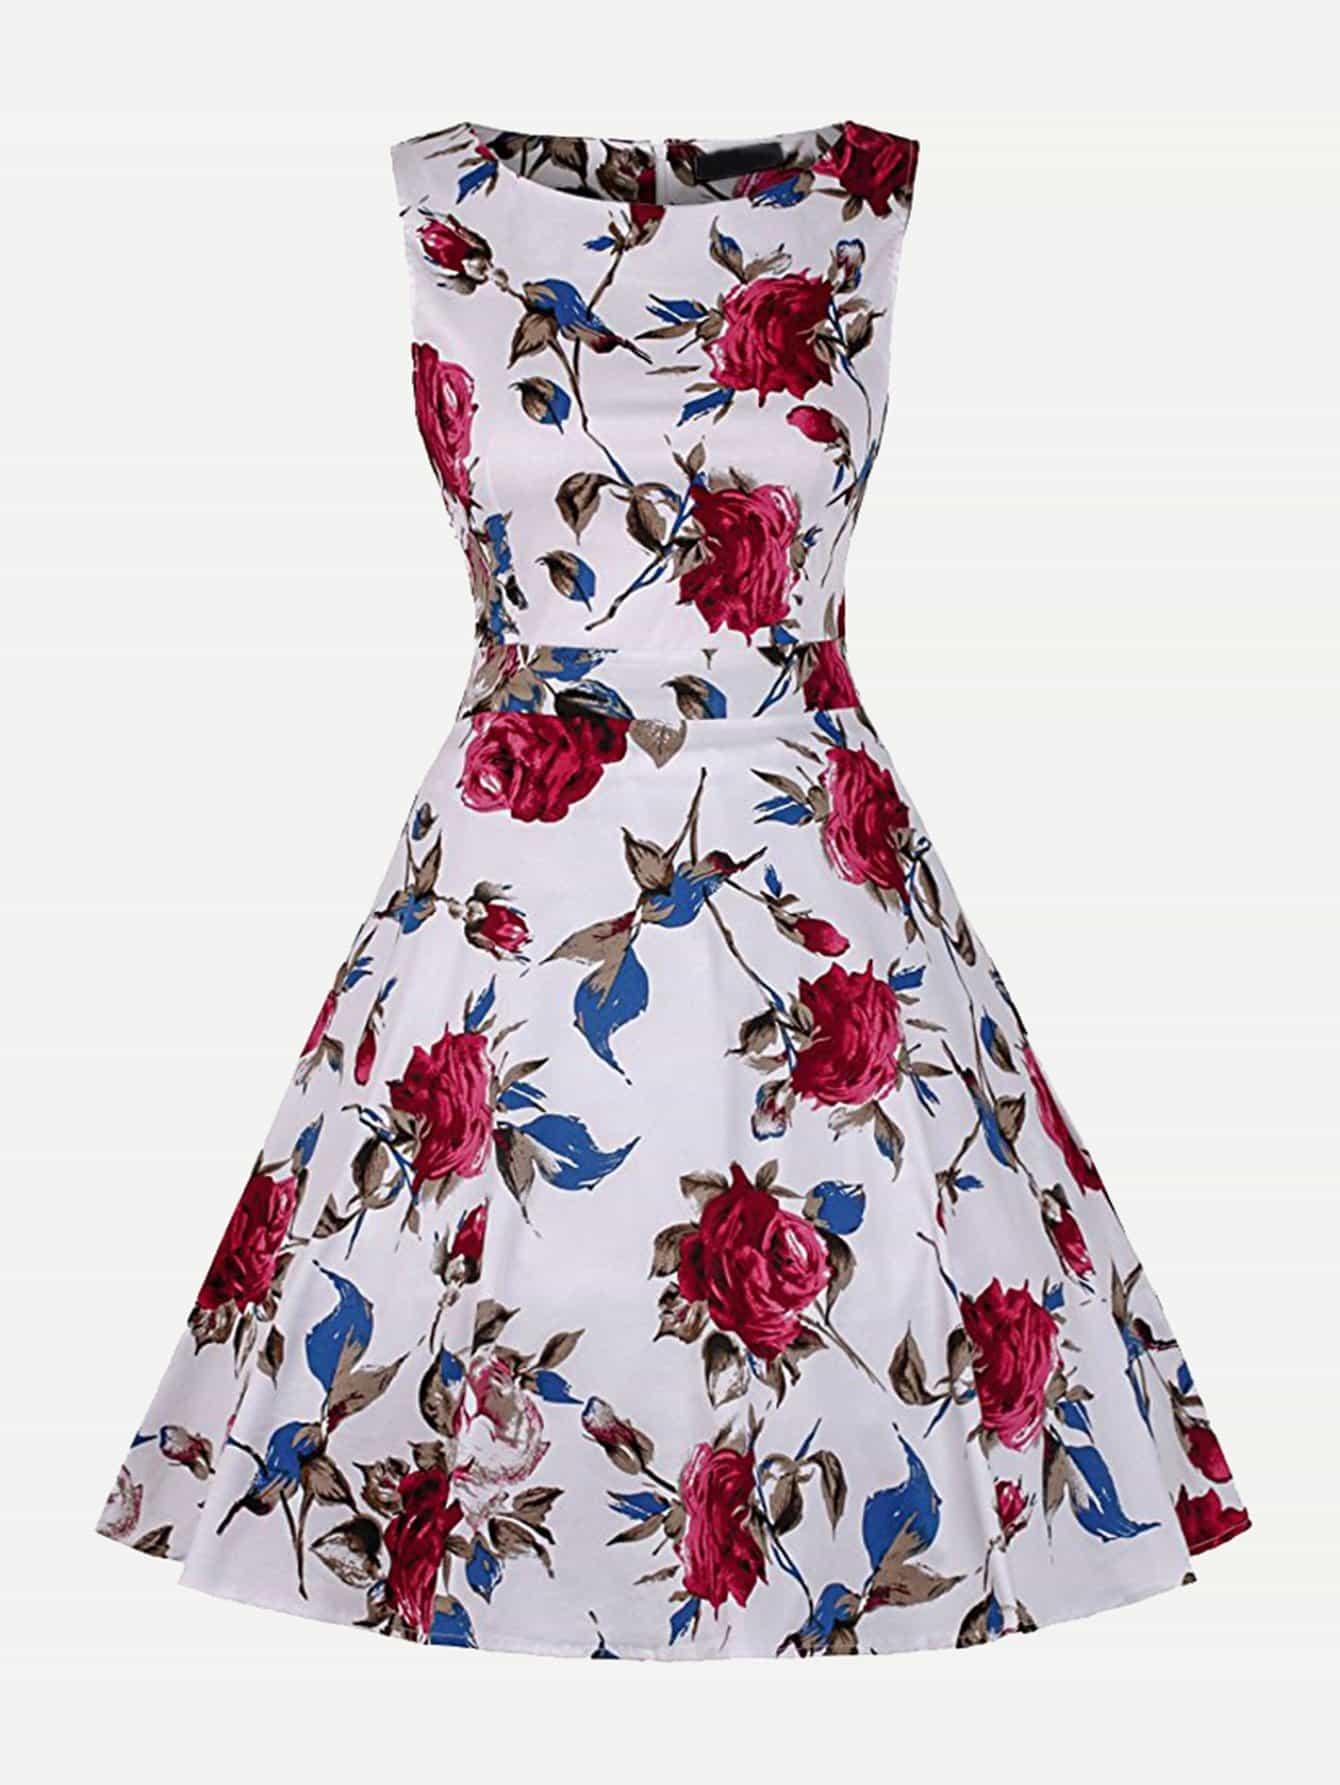 Floral Print Knot Back Dress mixed print colorblock knot back halter dress